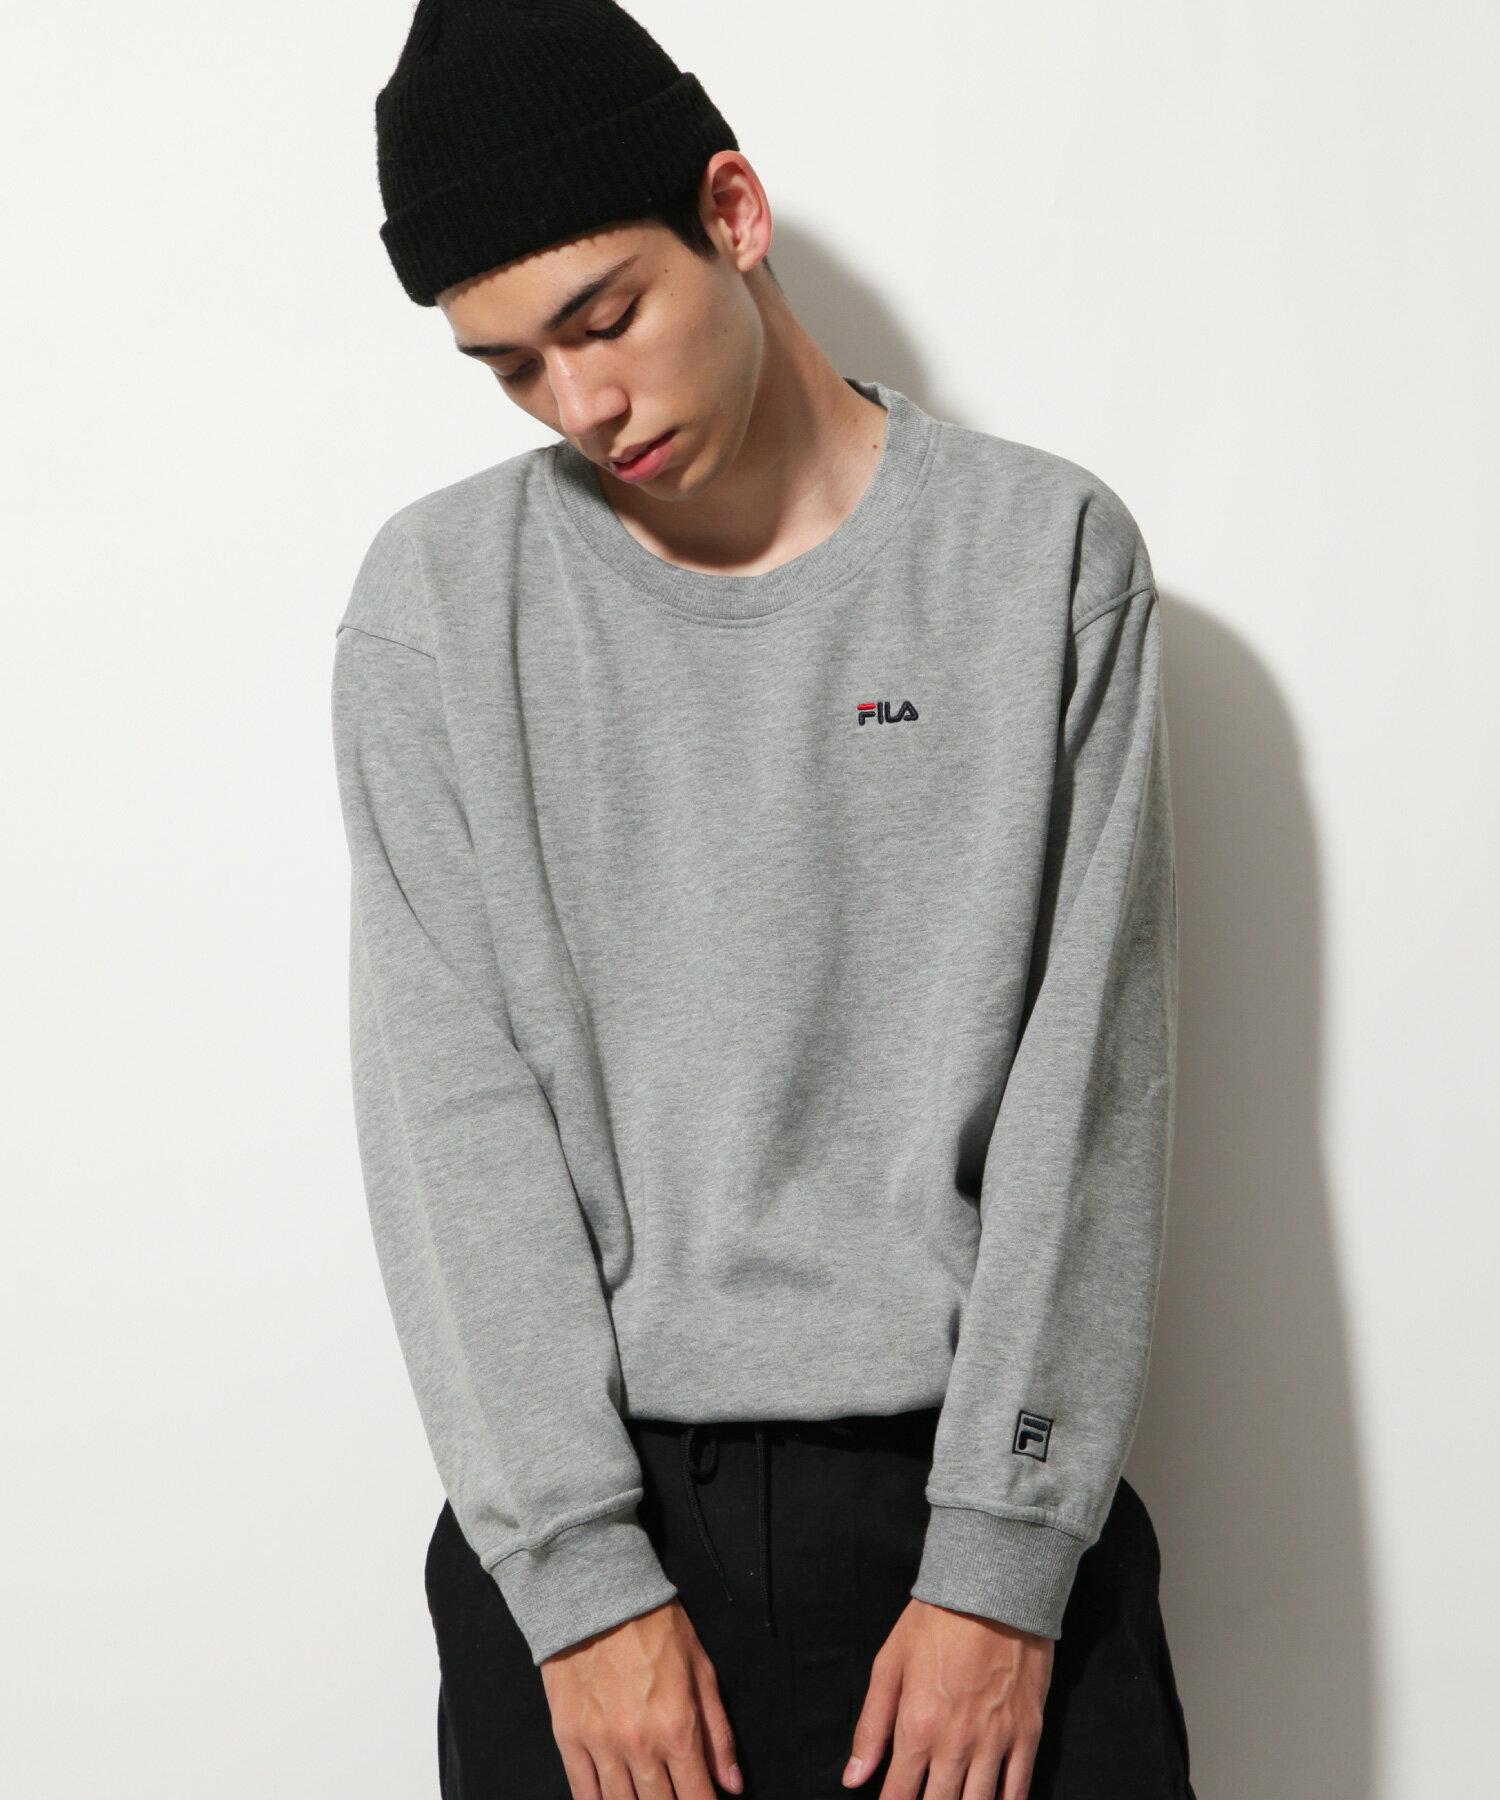 【FILA】LOGO刺繡內刷毛運動衫 2